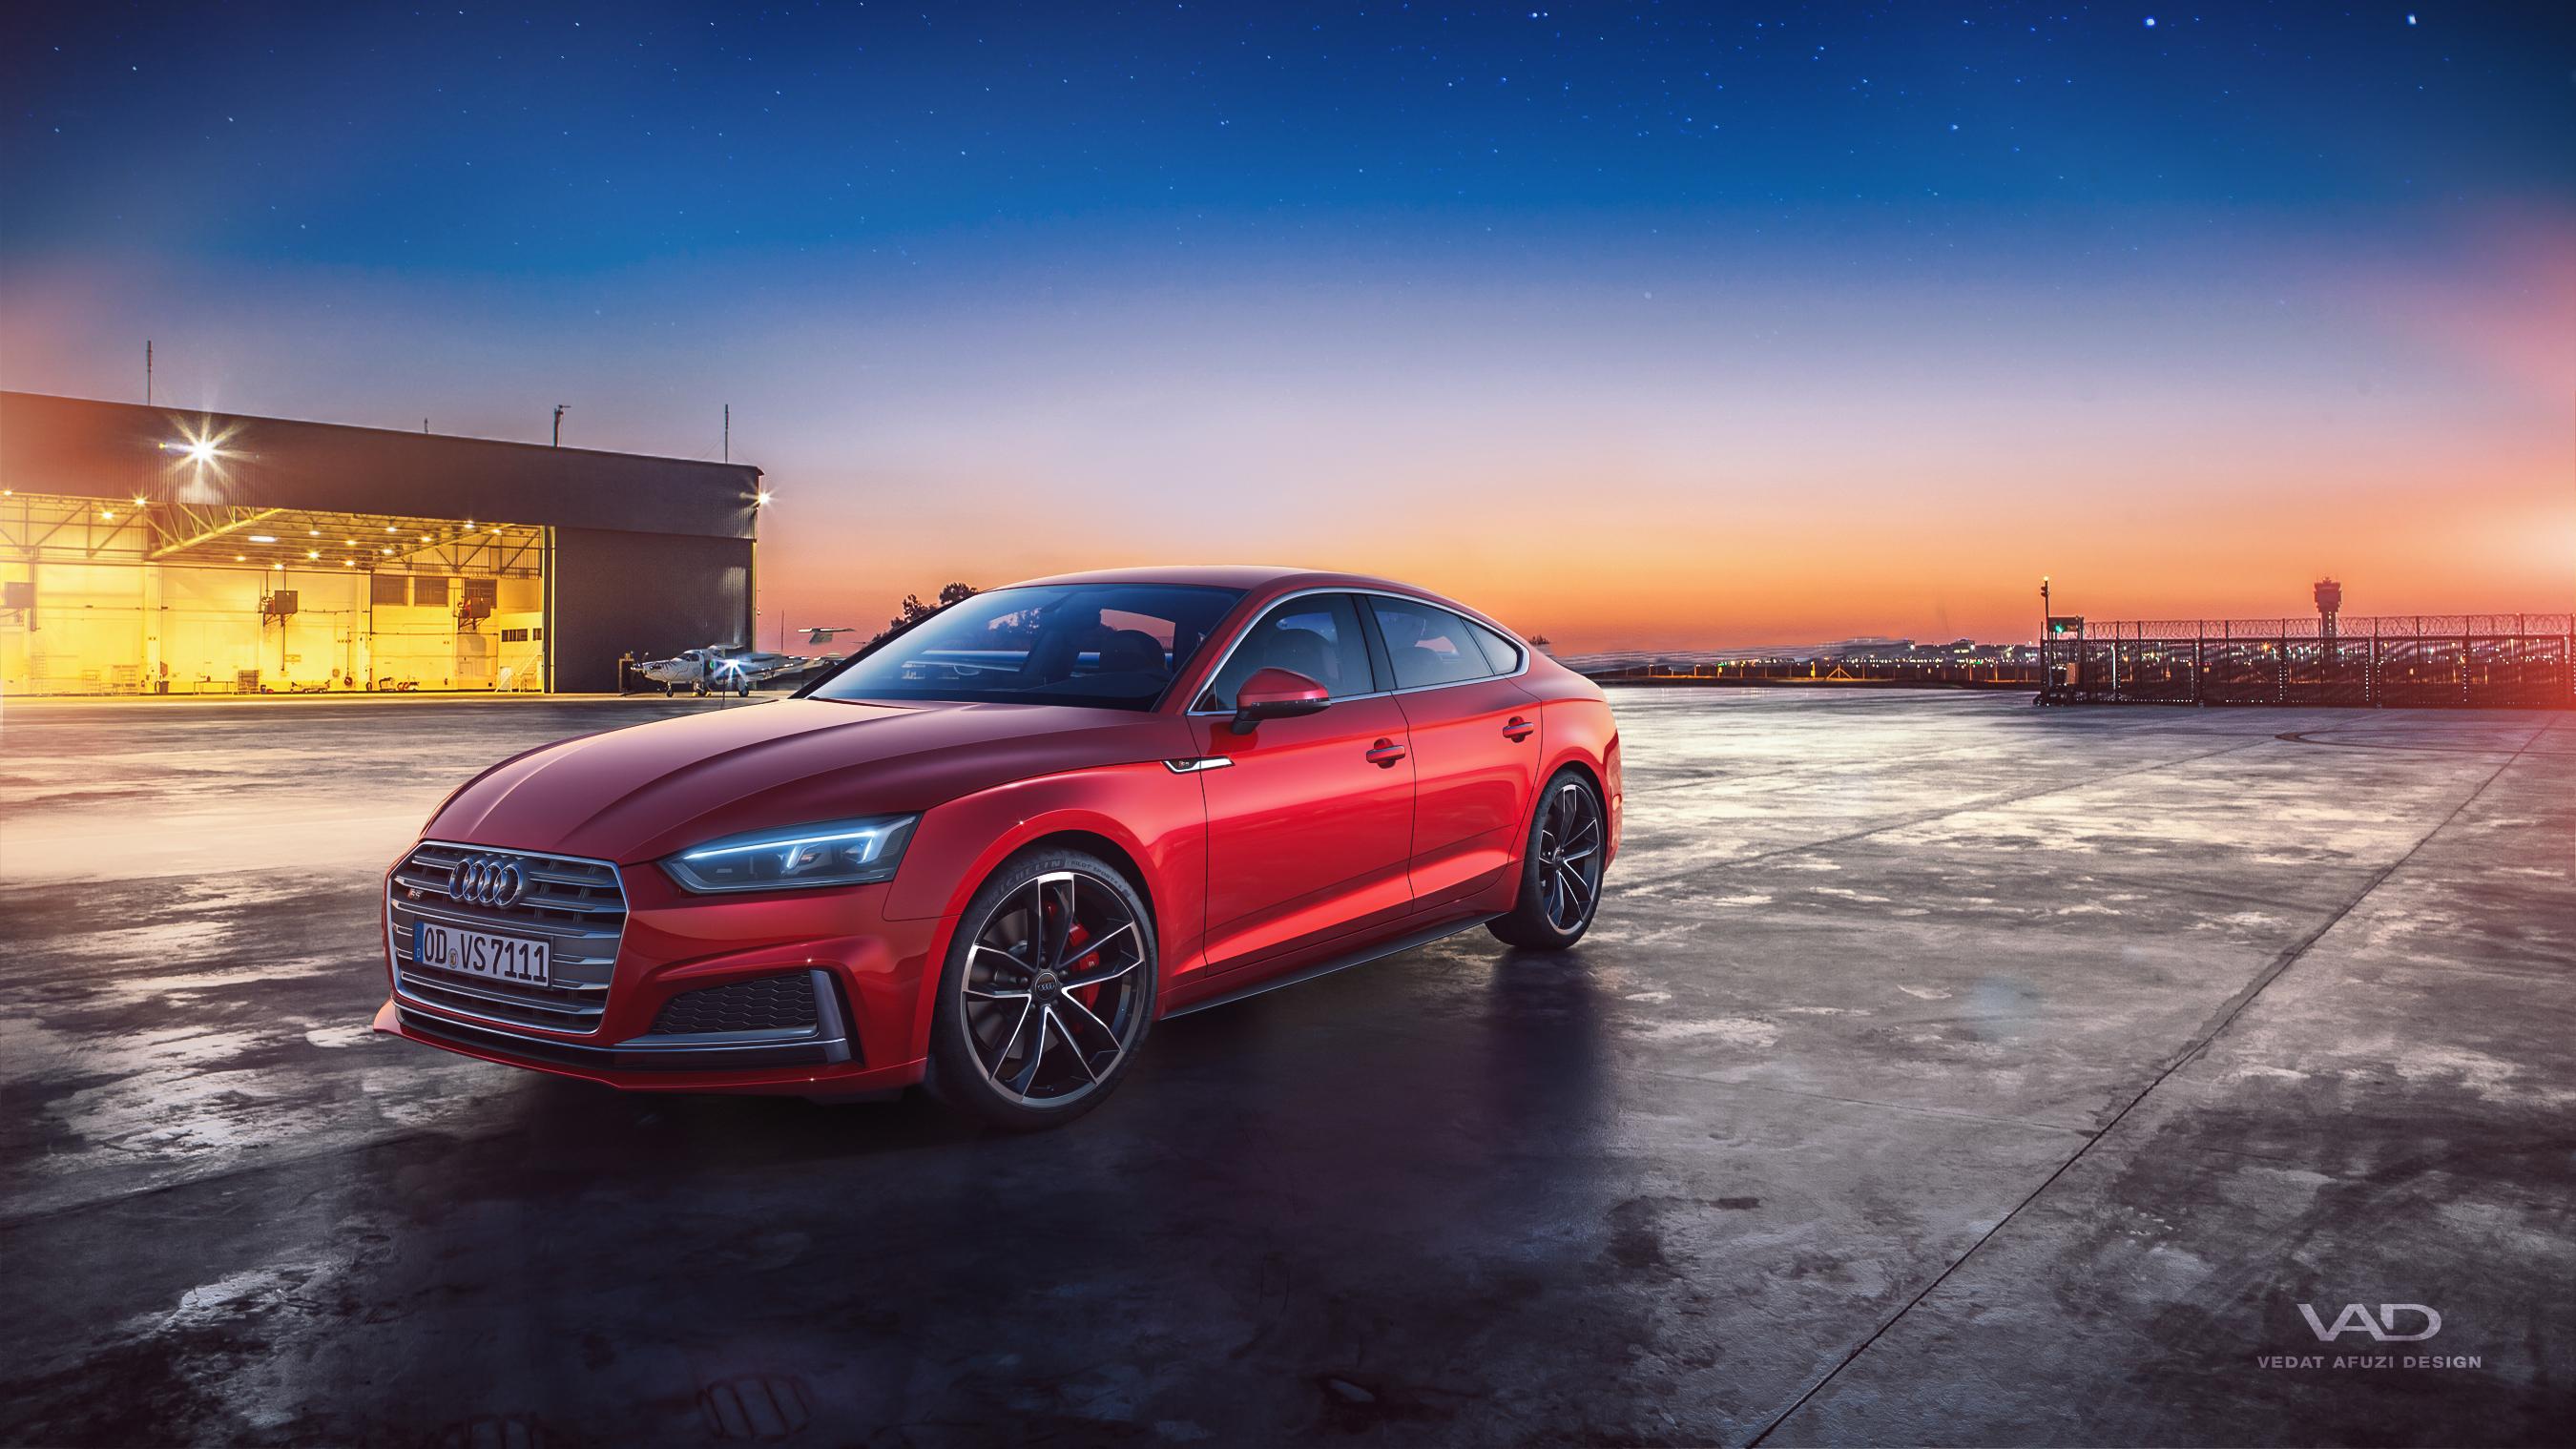 Audi R8 Iphone Wallpaper Hd Audi S5 Sportback Cgi Wallpaper Hd Car Wallpapers Id 8404